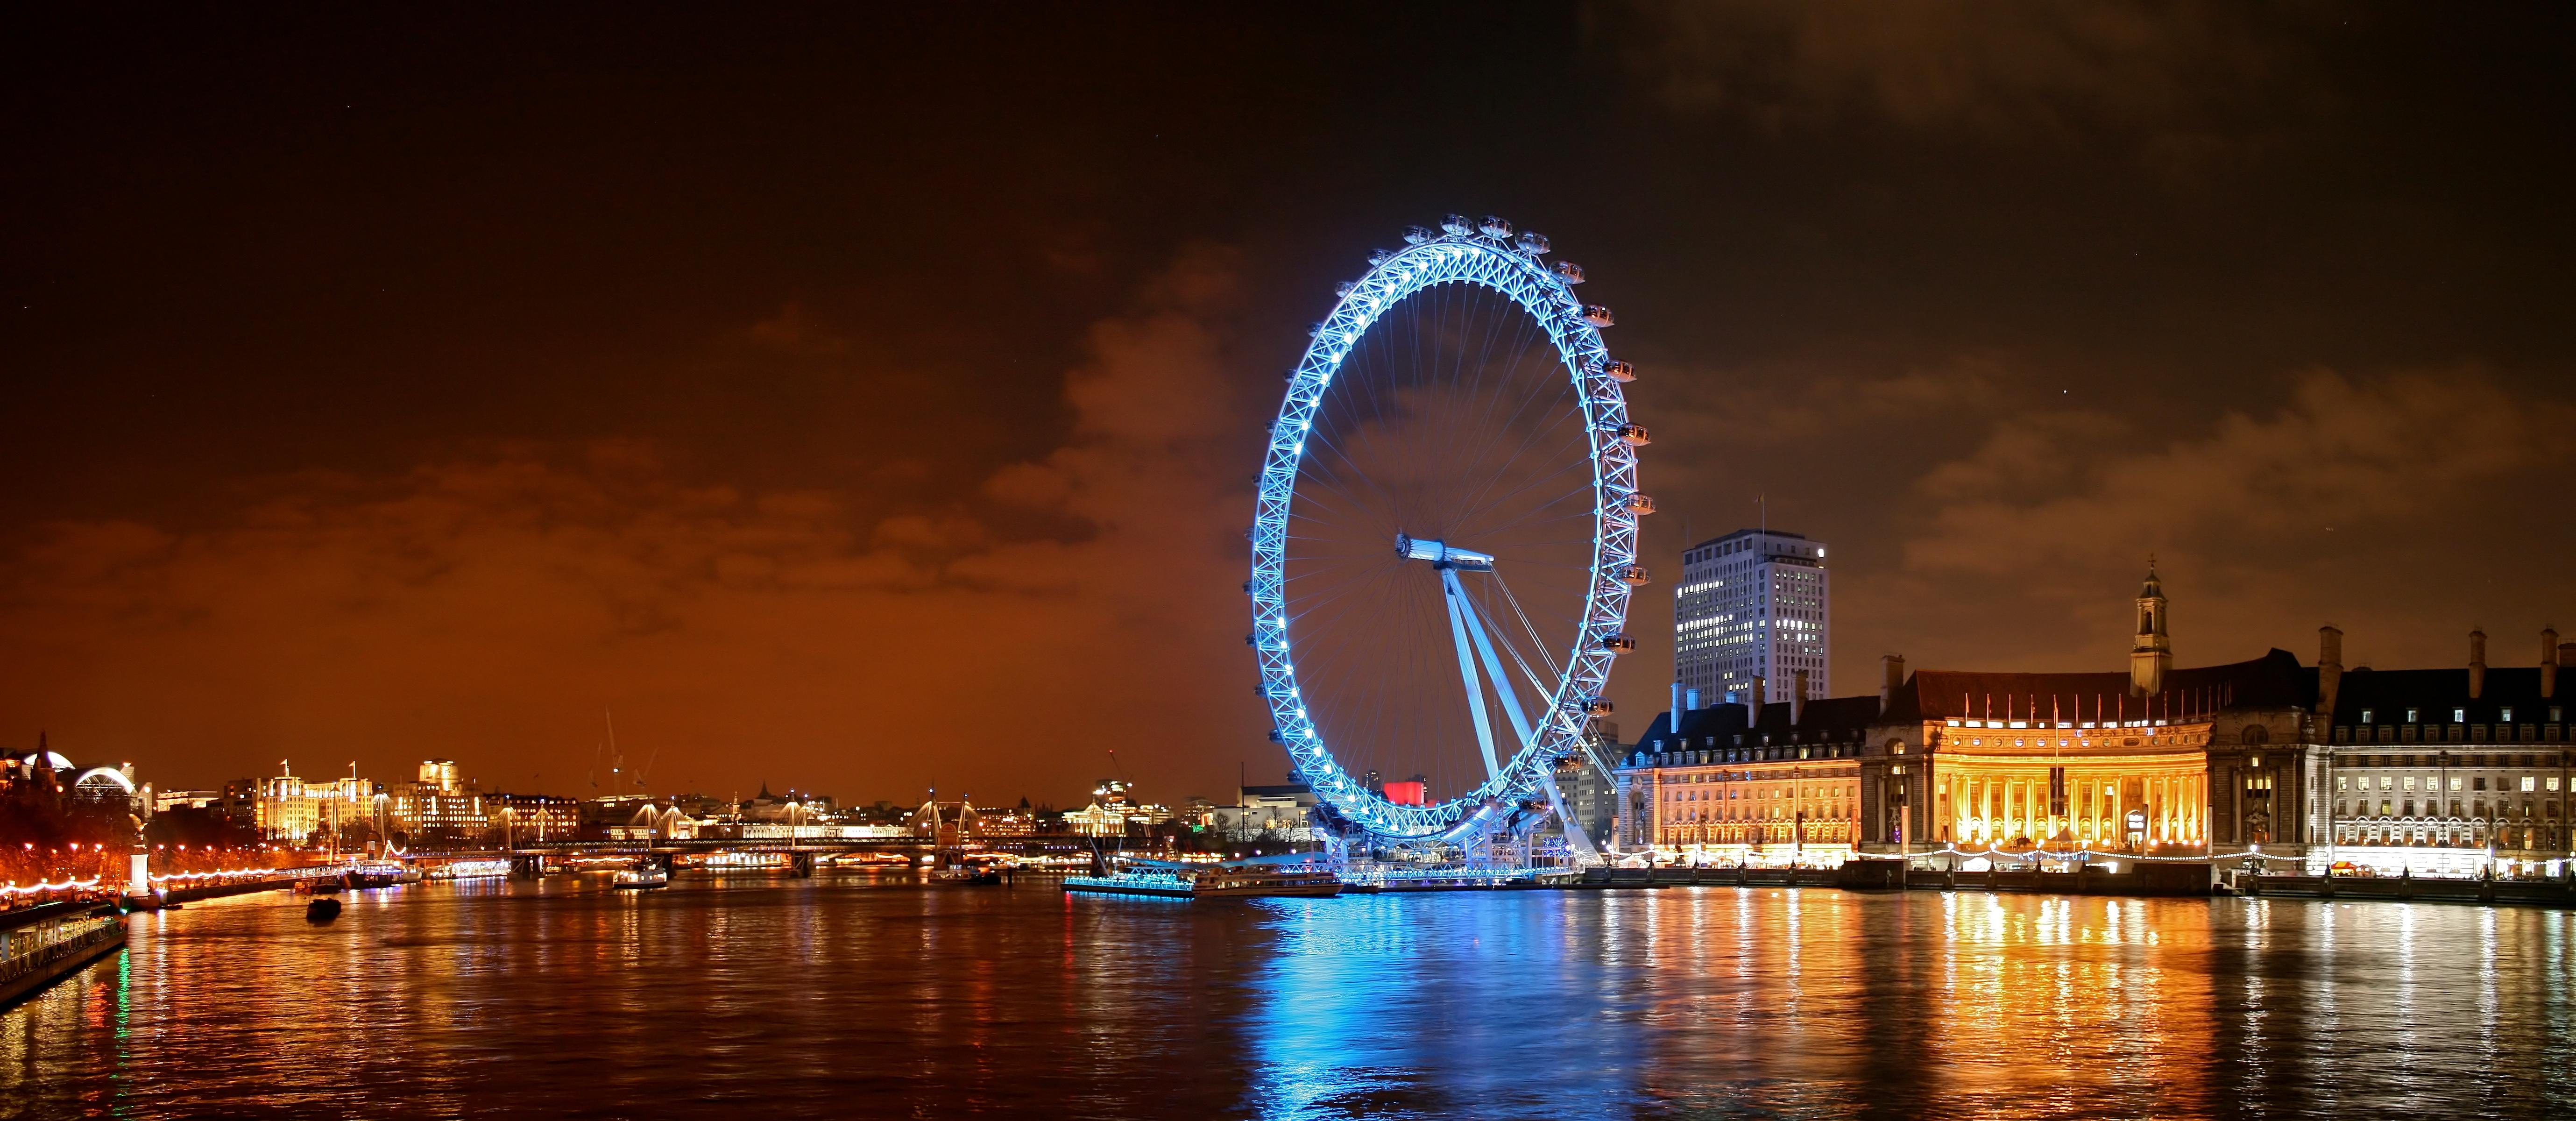 london eye by night - photo #16